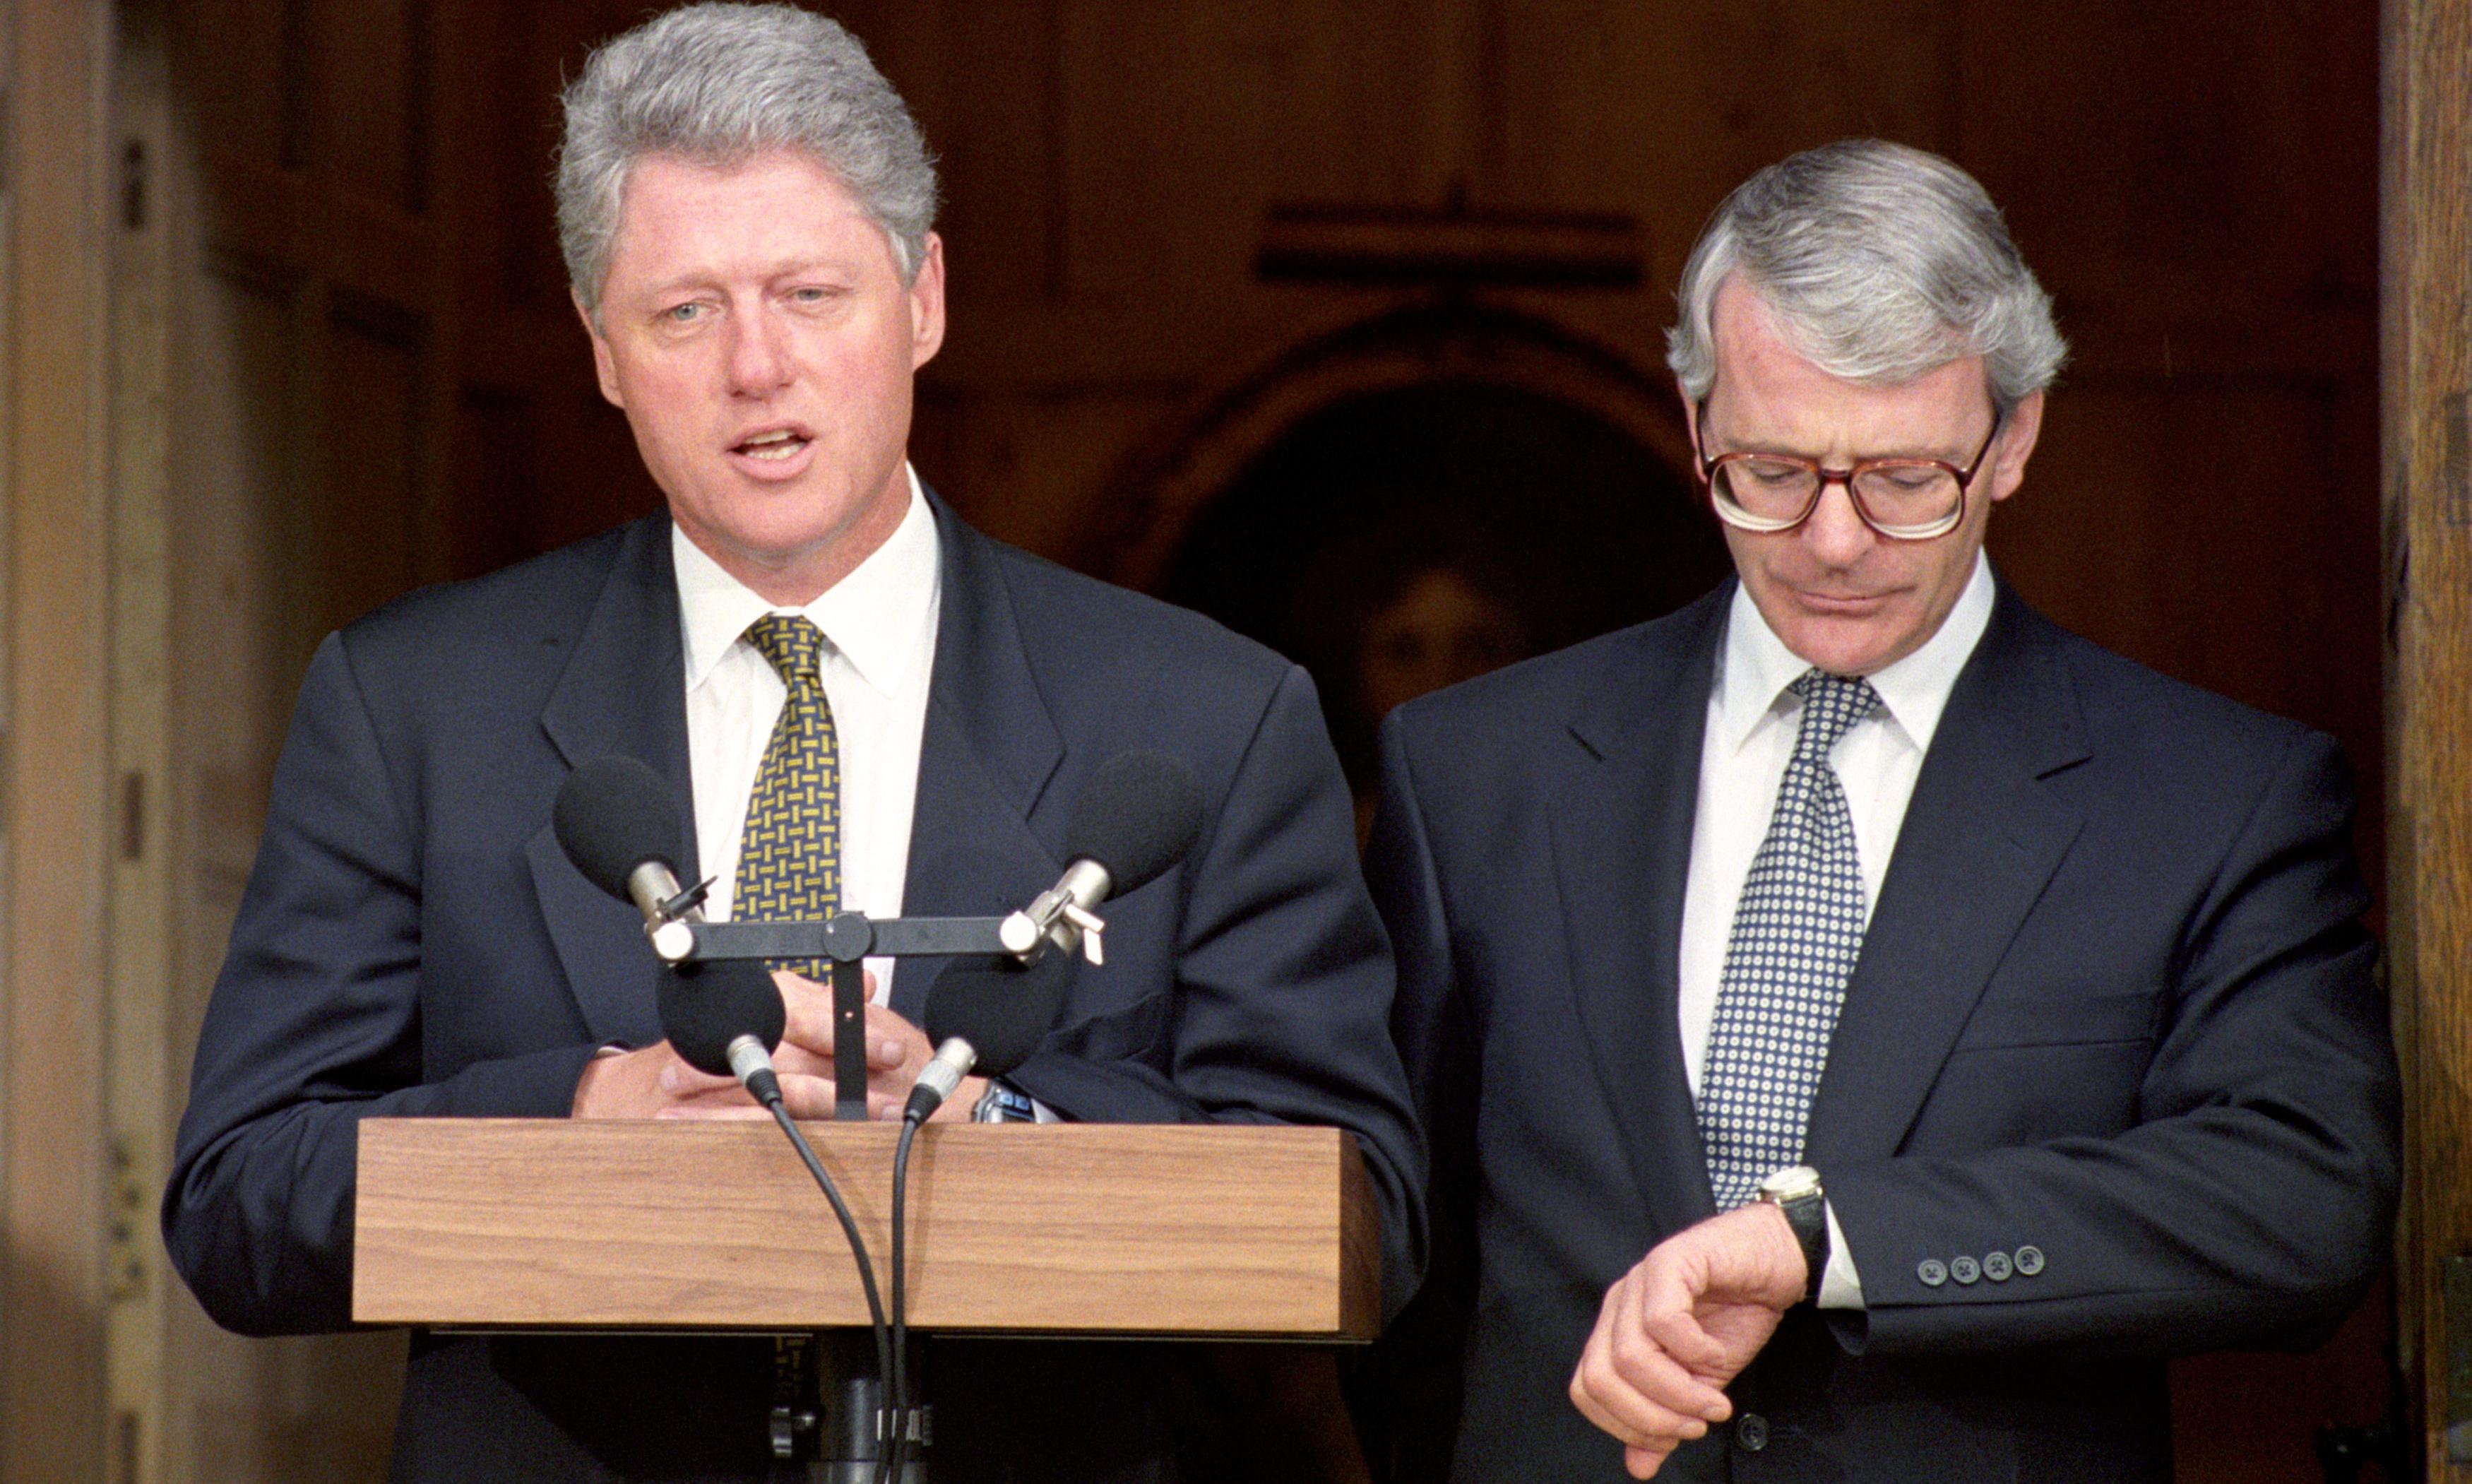 'Bill Clinton talks loudly, fails to act': envoys' barbed missives to John Major